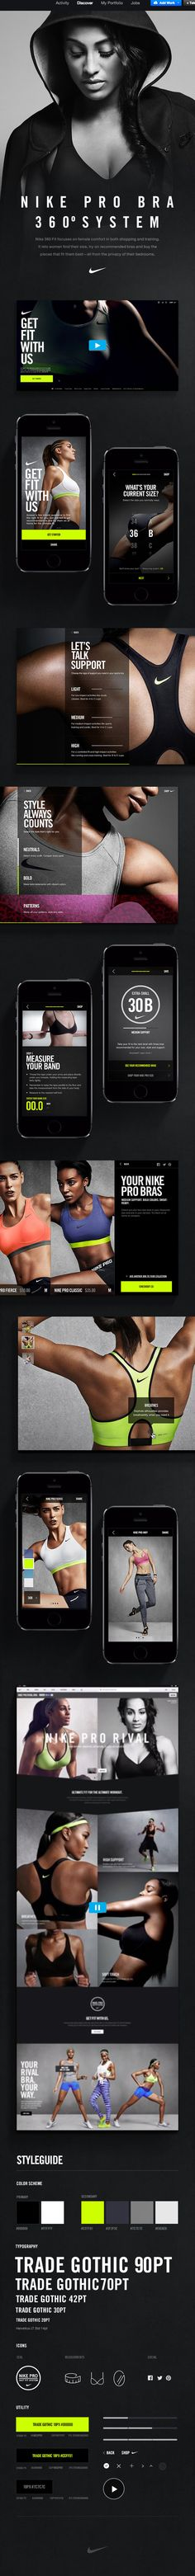 Nike #ui #interface #web #mobile